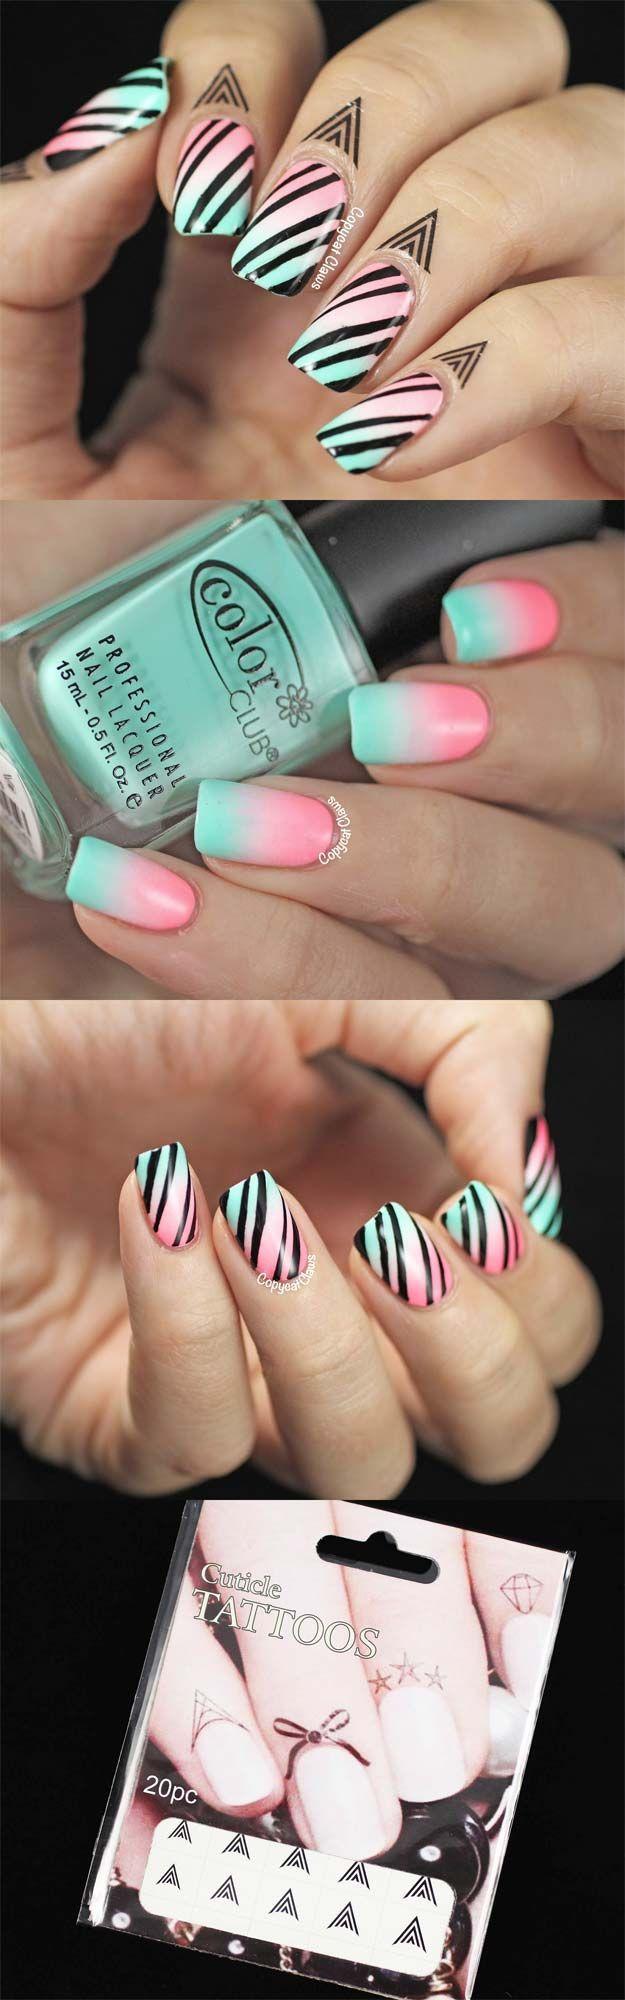 36 Striped Nail Art Ideas Pinterest Nail Art Stripes Nail Tape